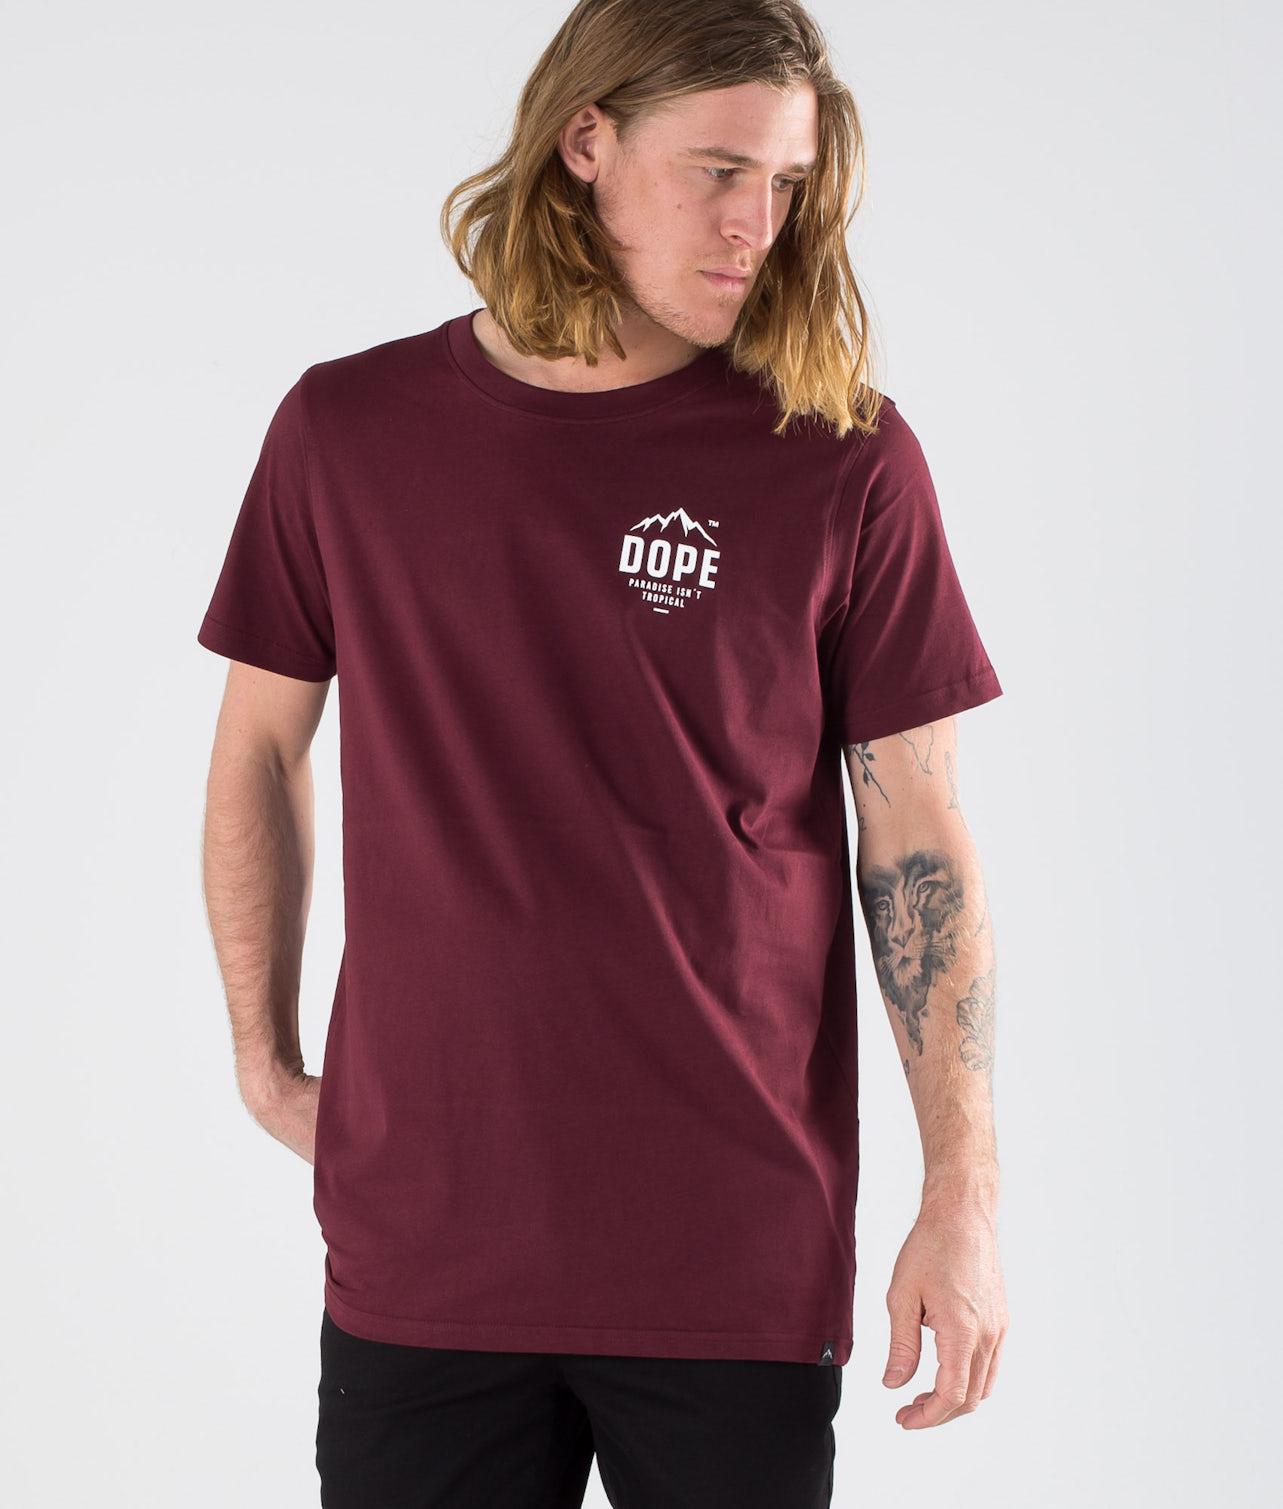 Dope Paradise II T-shirt Burgundy